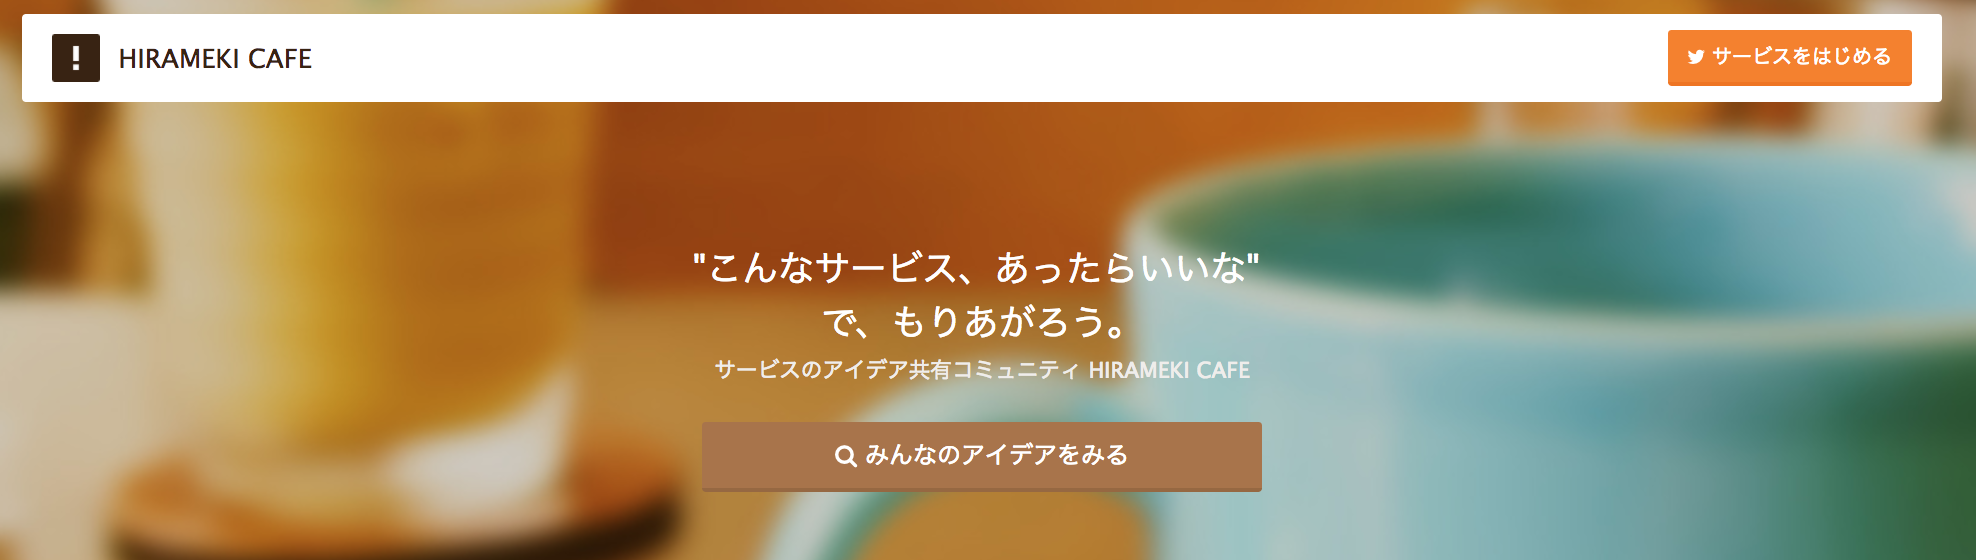 【HIRAMEKI CAFE】「あったらいいな」というサービスアイデアを共有するサービスを知っているかな?